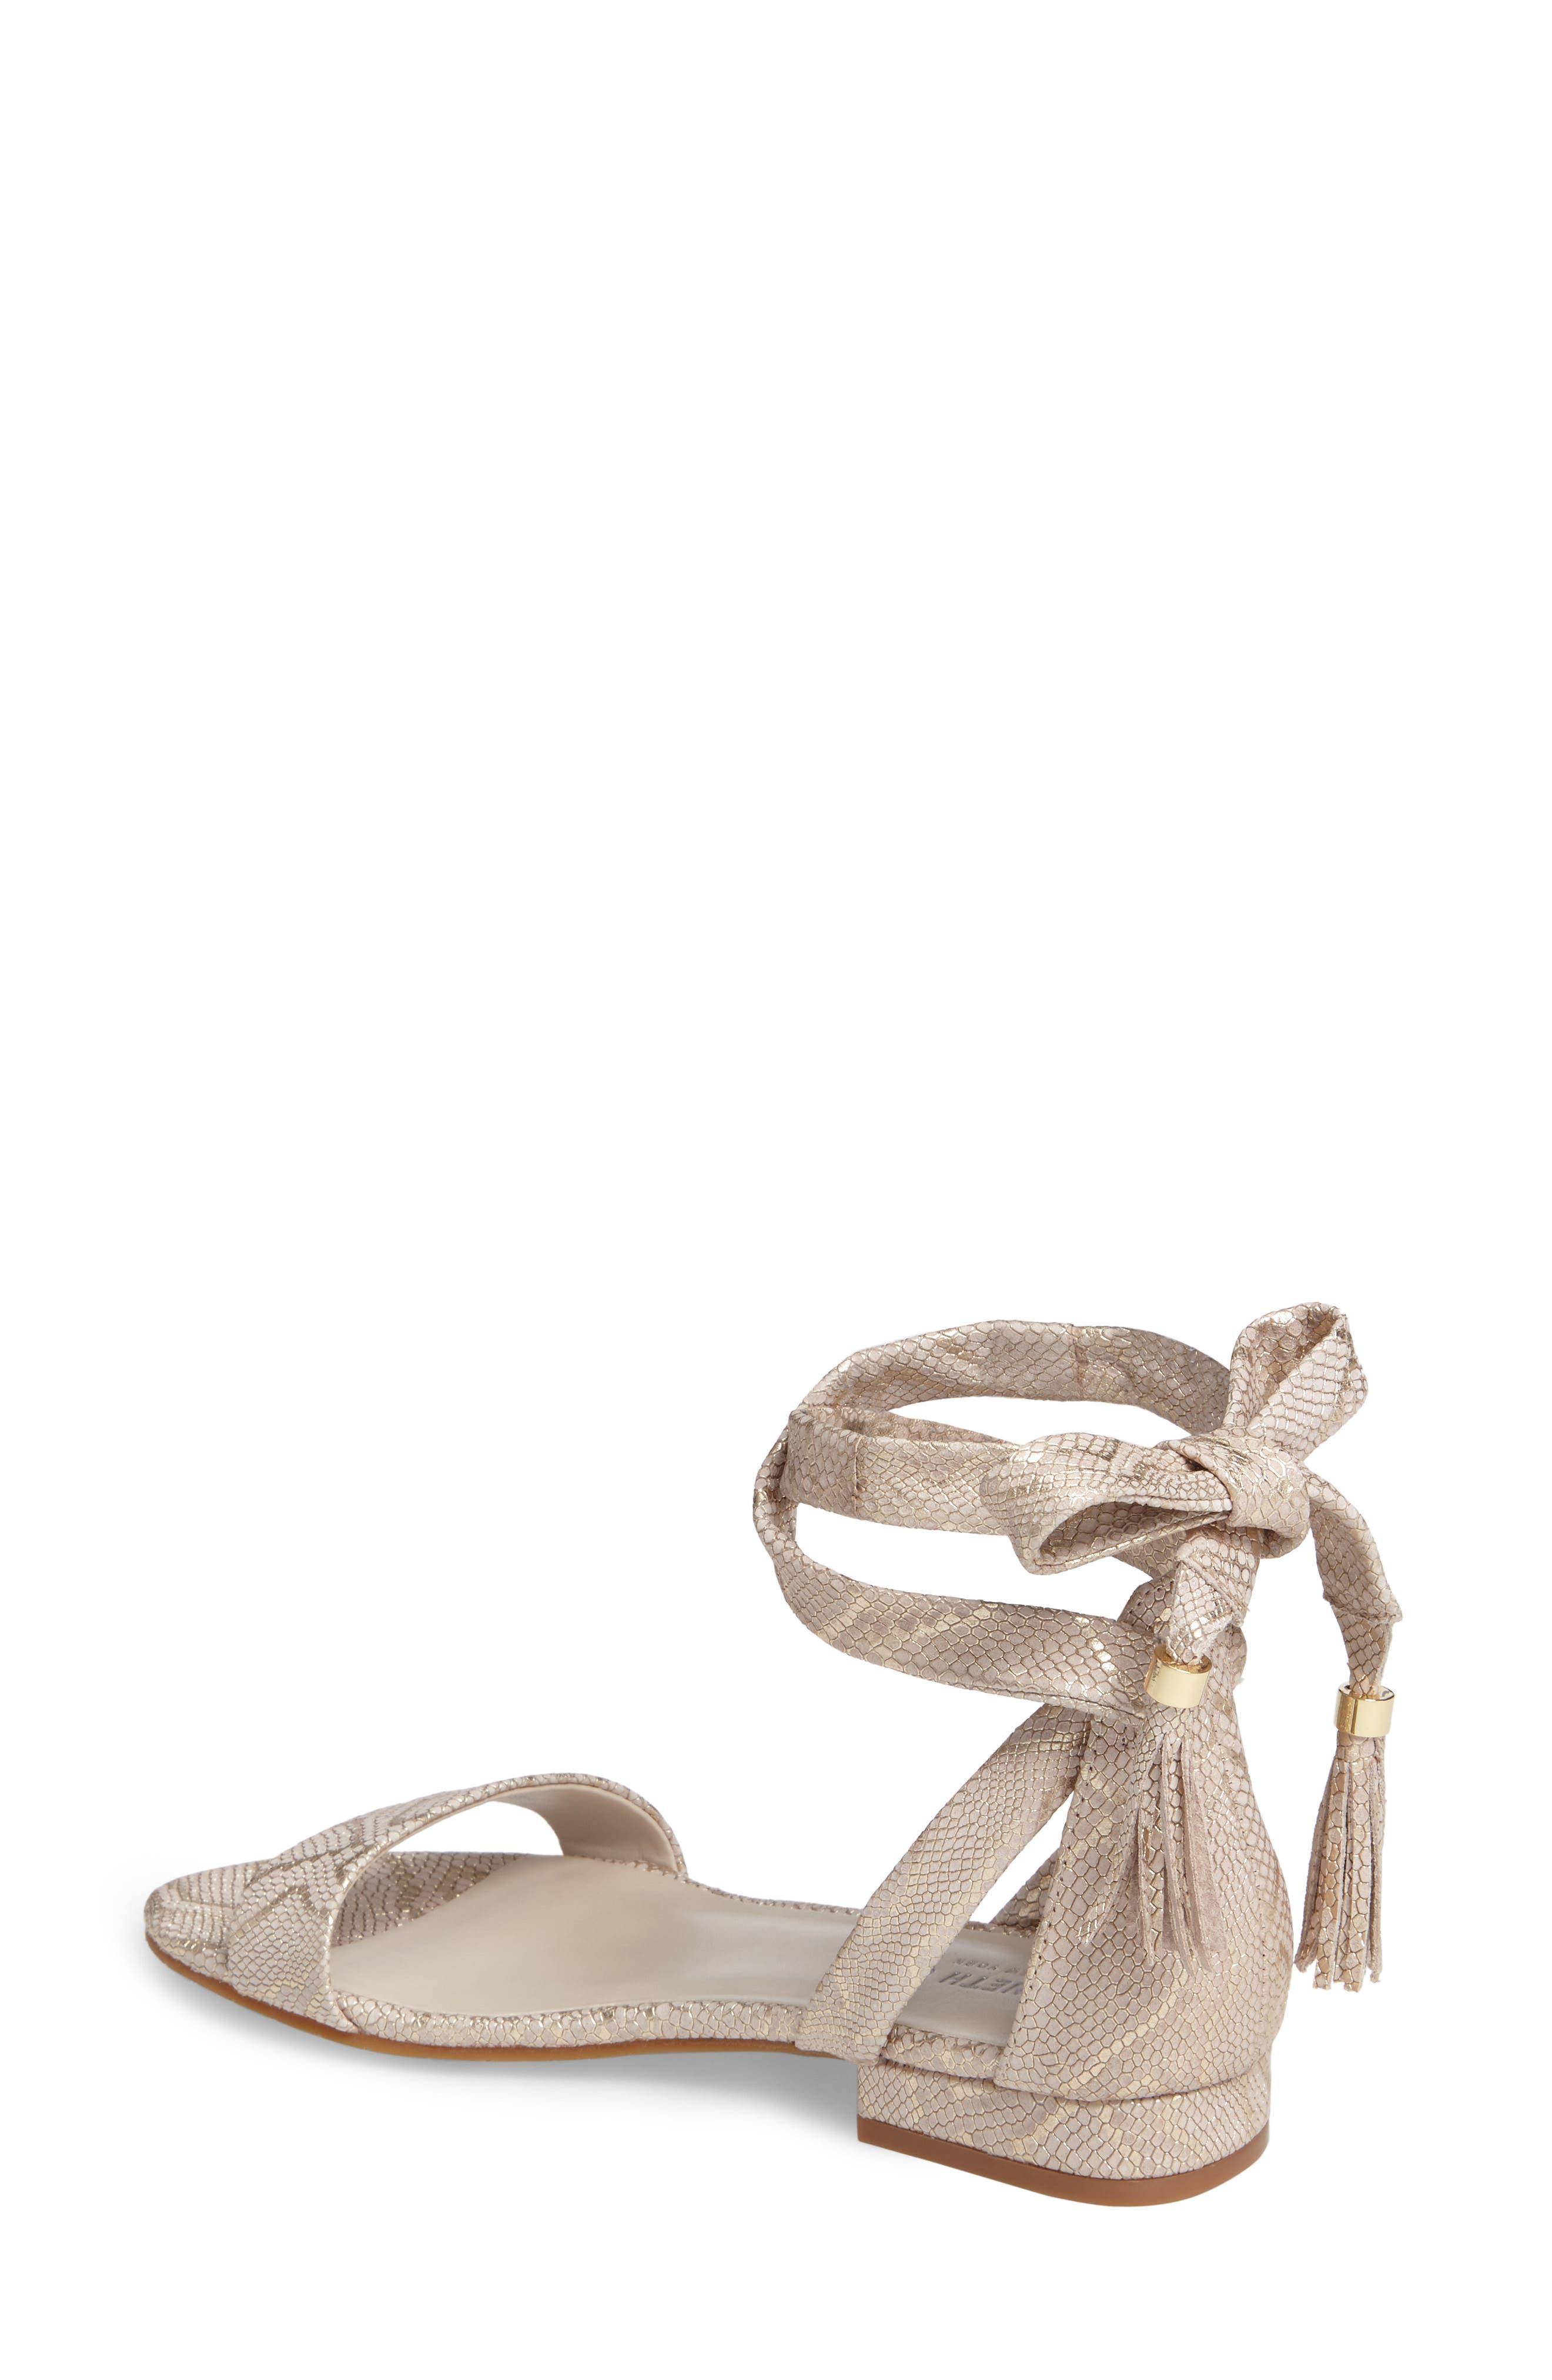 Valen Tassel Lace-Up Sandal,                             Alternate thumbnail 18, color,